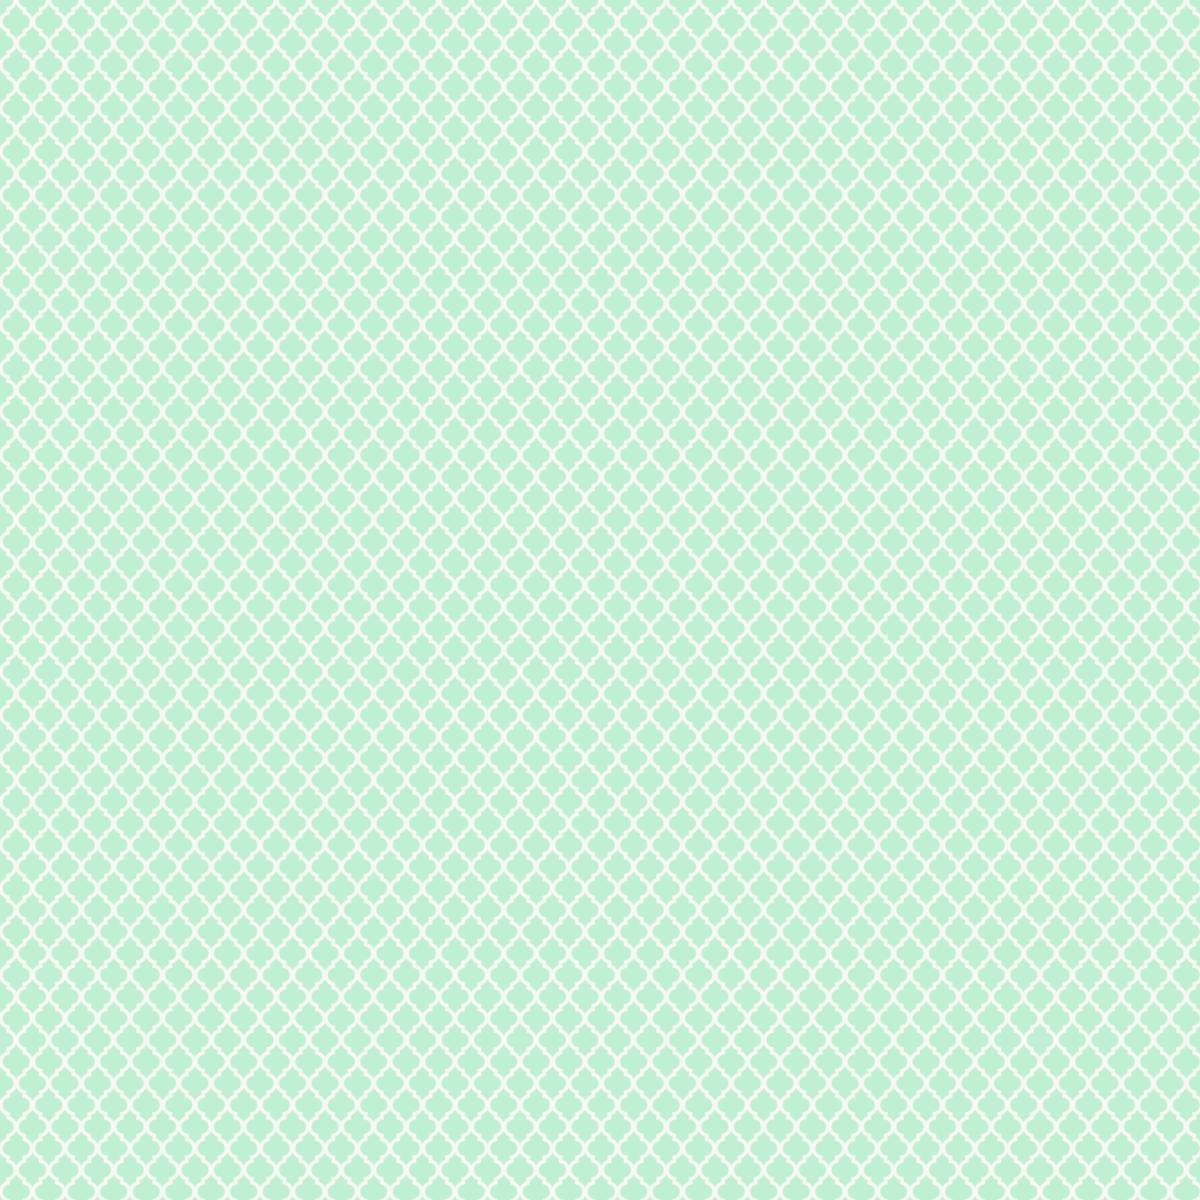 free digital quatrefoil scrapbooking papers ii schmuckpapier freebies meinlilapark. Black Bedroom Furniture Sets. Home Design Ideas